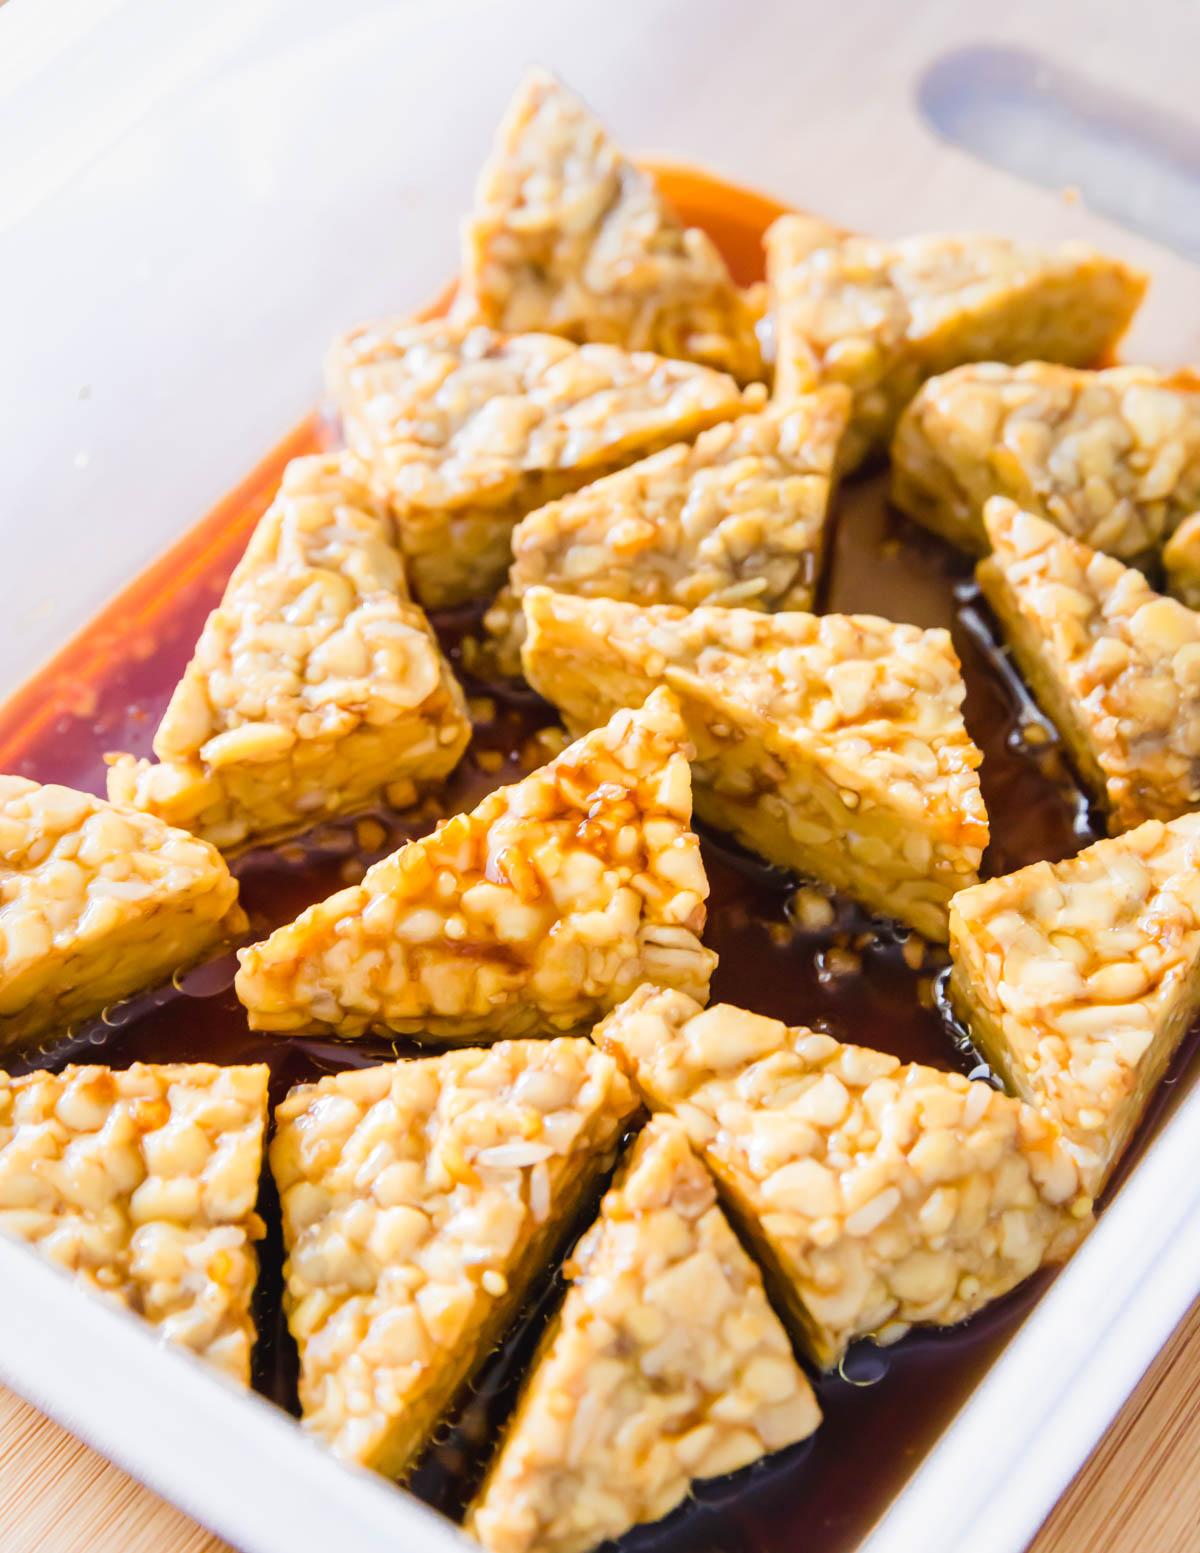 Gluten-free tempeh marinade using tamari, maple syrup, balsamic vinegar, garlic and avocado oil.